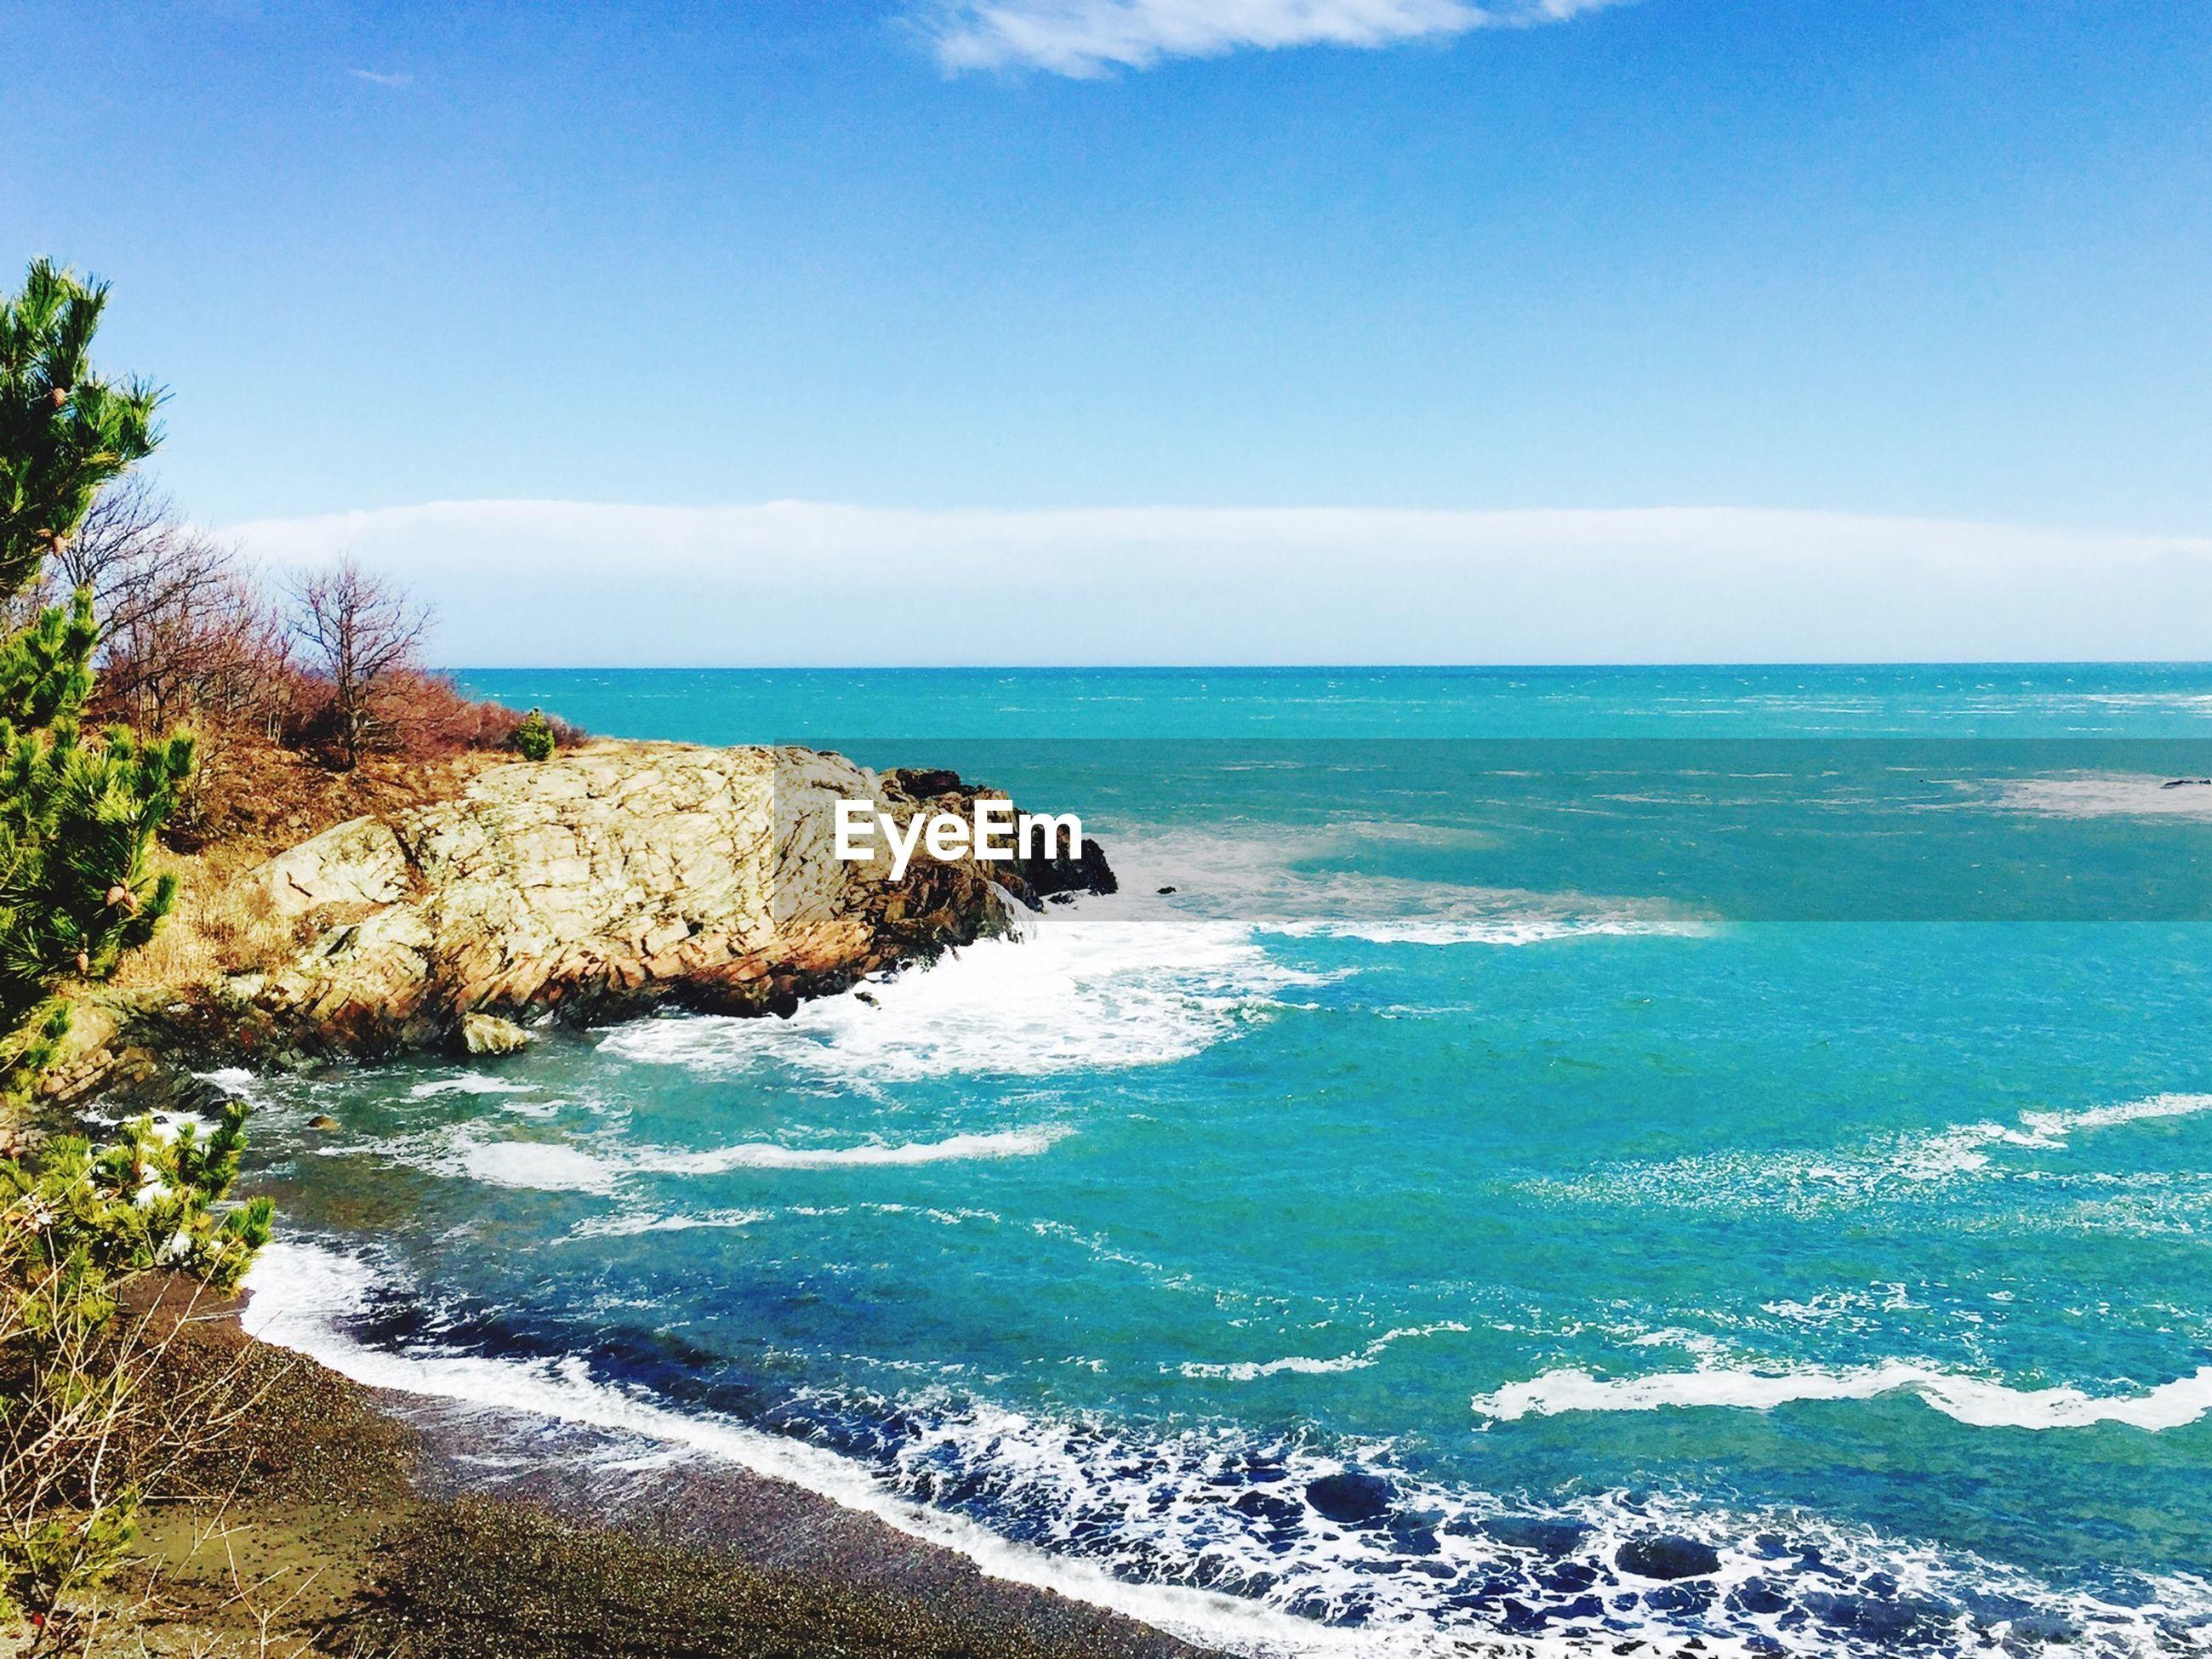 sea, water, horizon over water, tranquil scene, scenics, tranquility, beauty in nature, beach, sky, nature, blue, shore, rock formation, rock - object, sand, coastline, cliff, idyllic, rock, non-urban scene